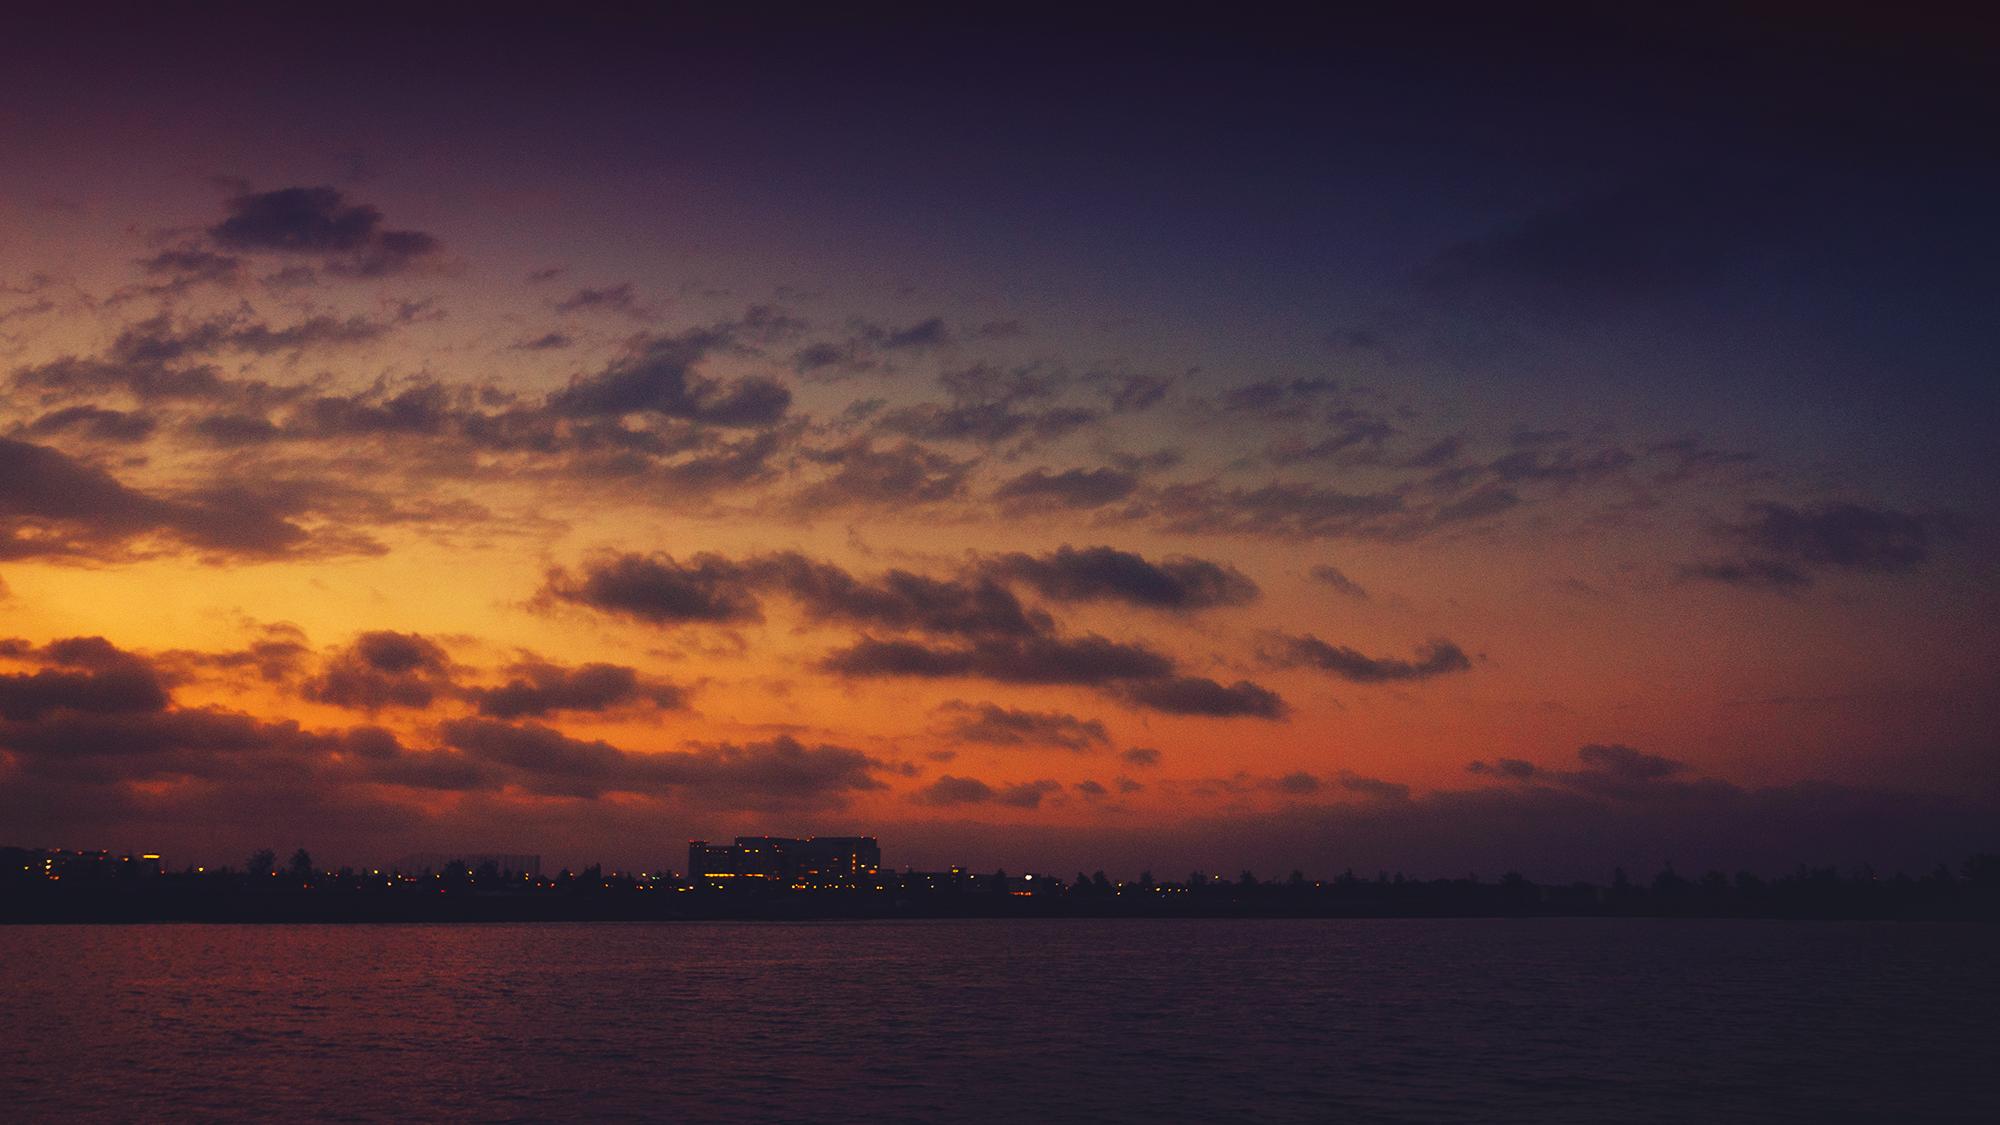 Dark Sunset with city lights